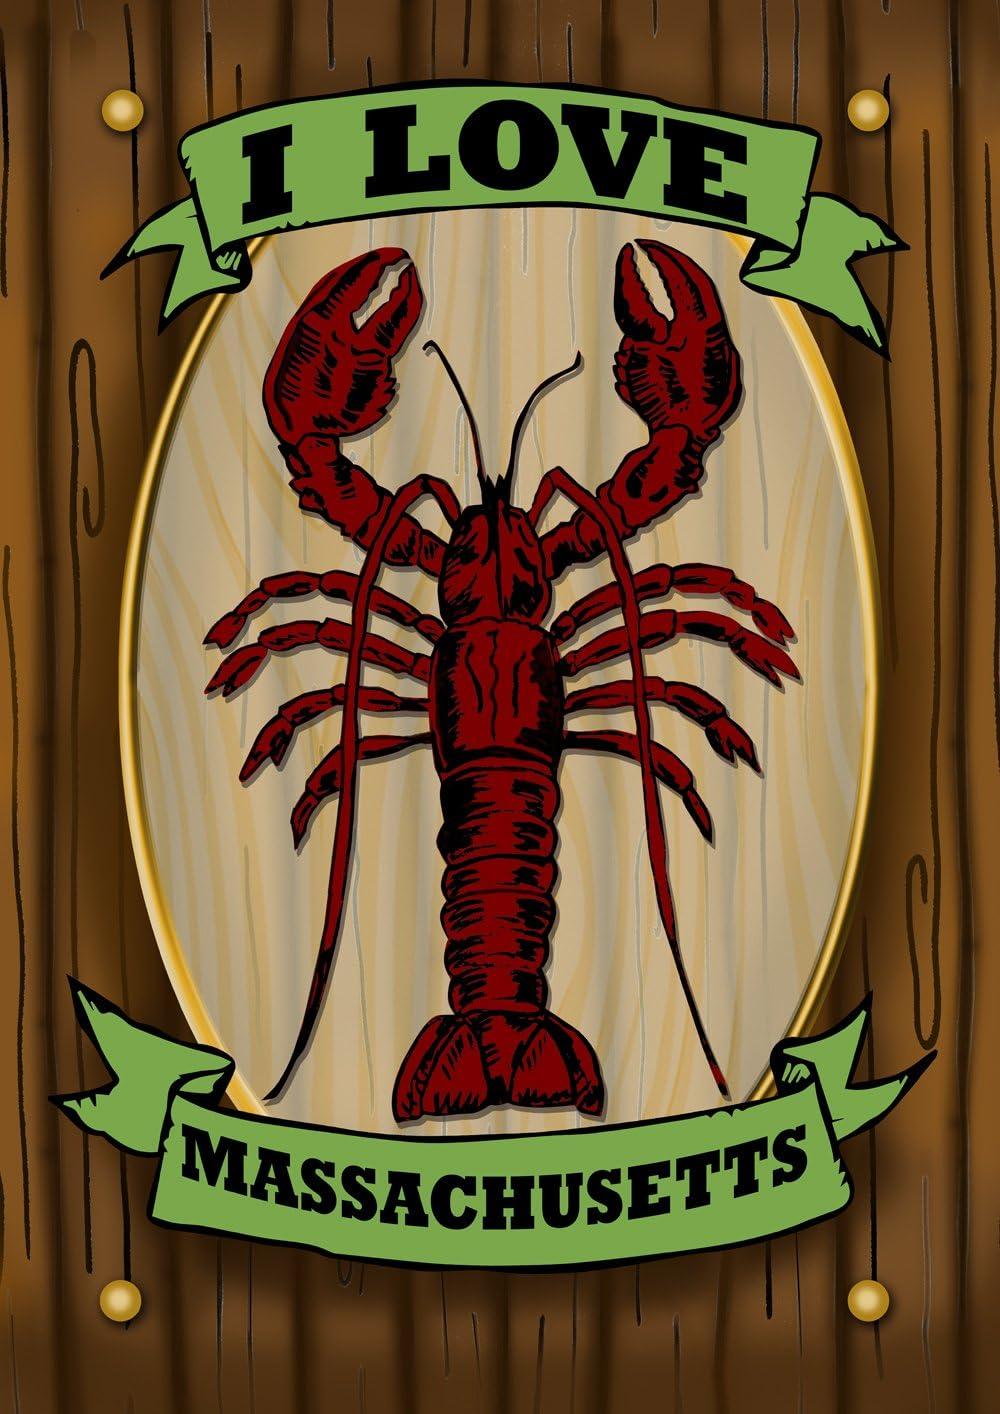 Toland Home Garden Massachusetts Lobster Sign 12.5 x 18 Inch Decorative Rustic Coastal Love Garden Flag